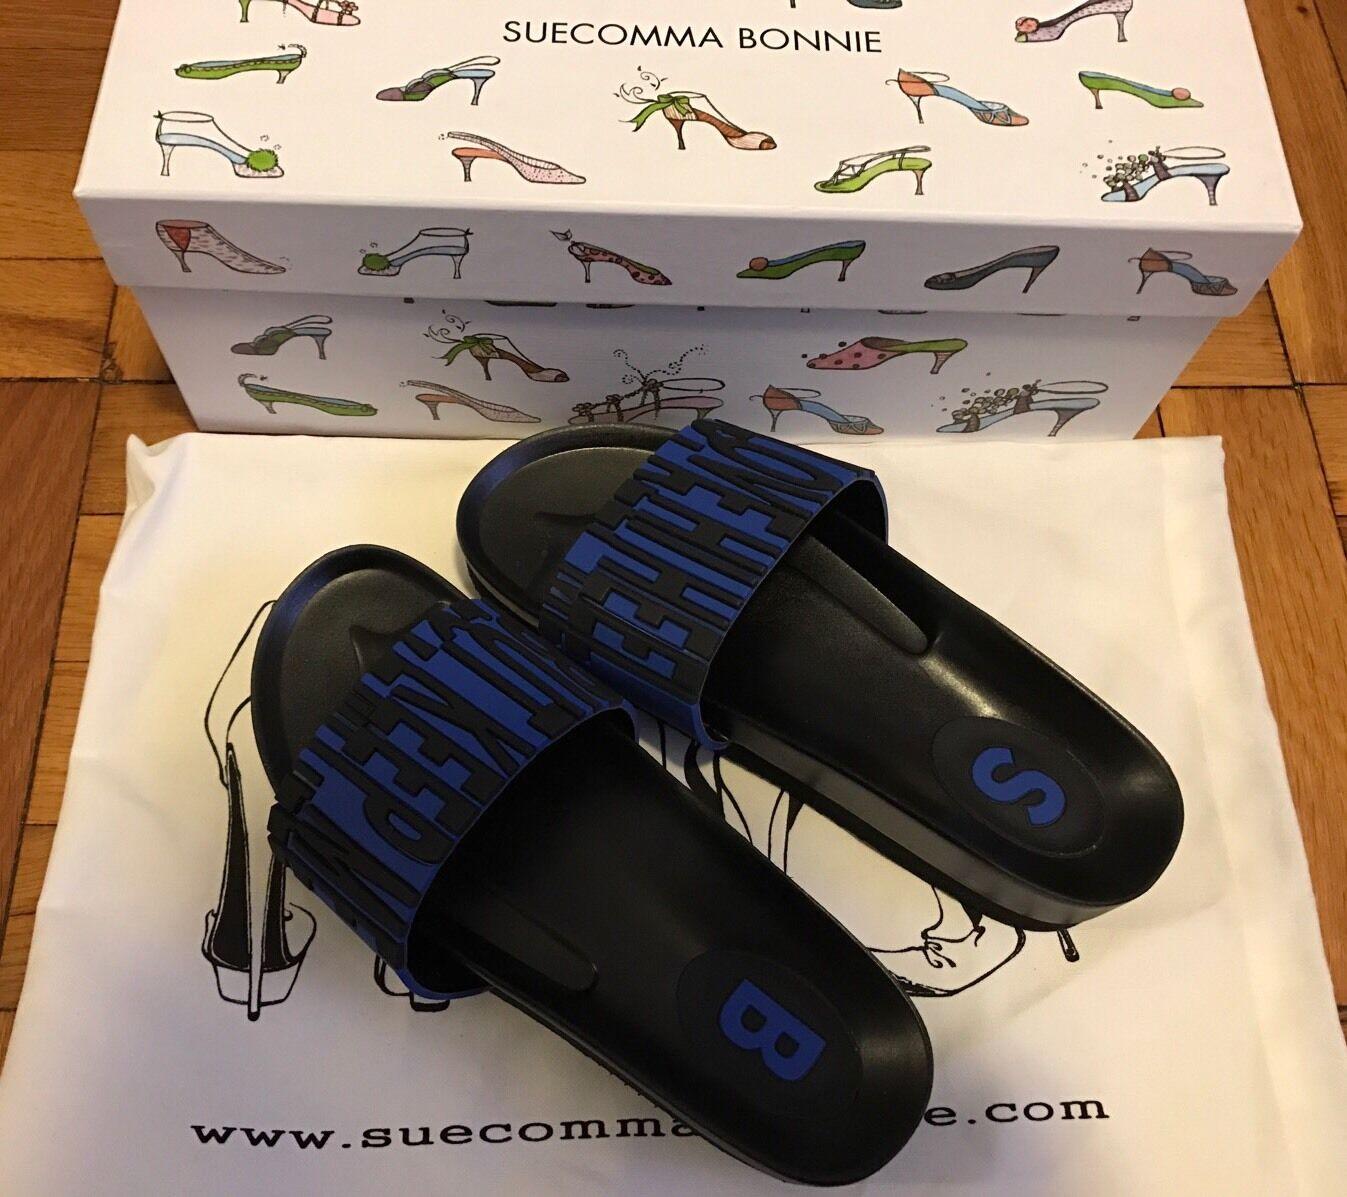 New SUECOMMA BONNIE BLACK & Blau Slippers Größe 36.5 36.5 36.5 92bc6f